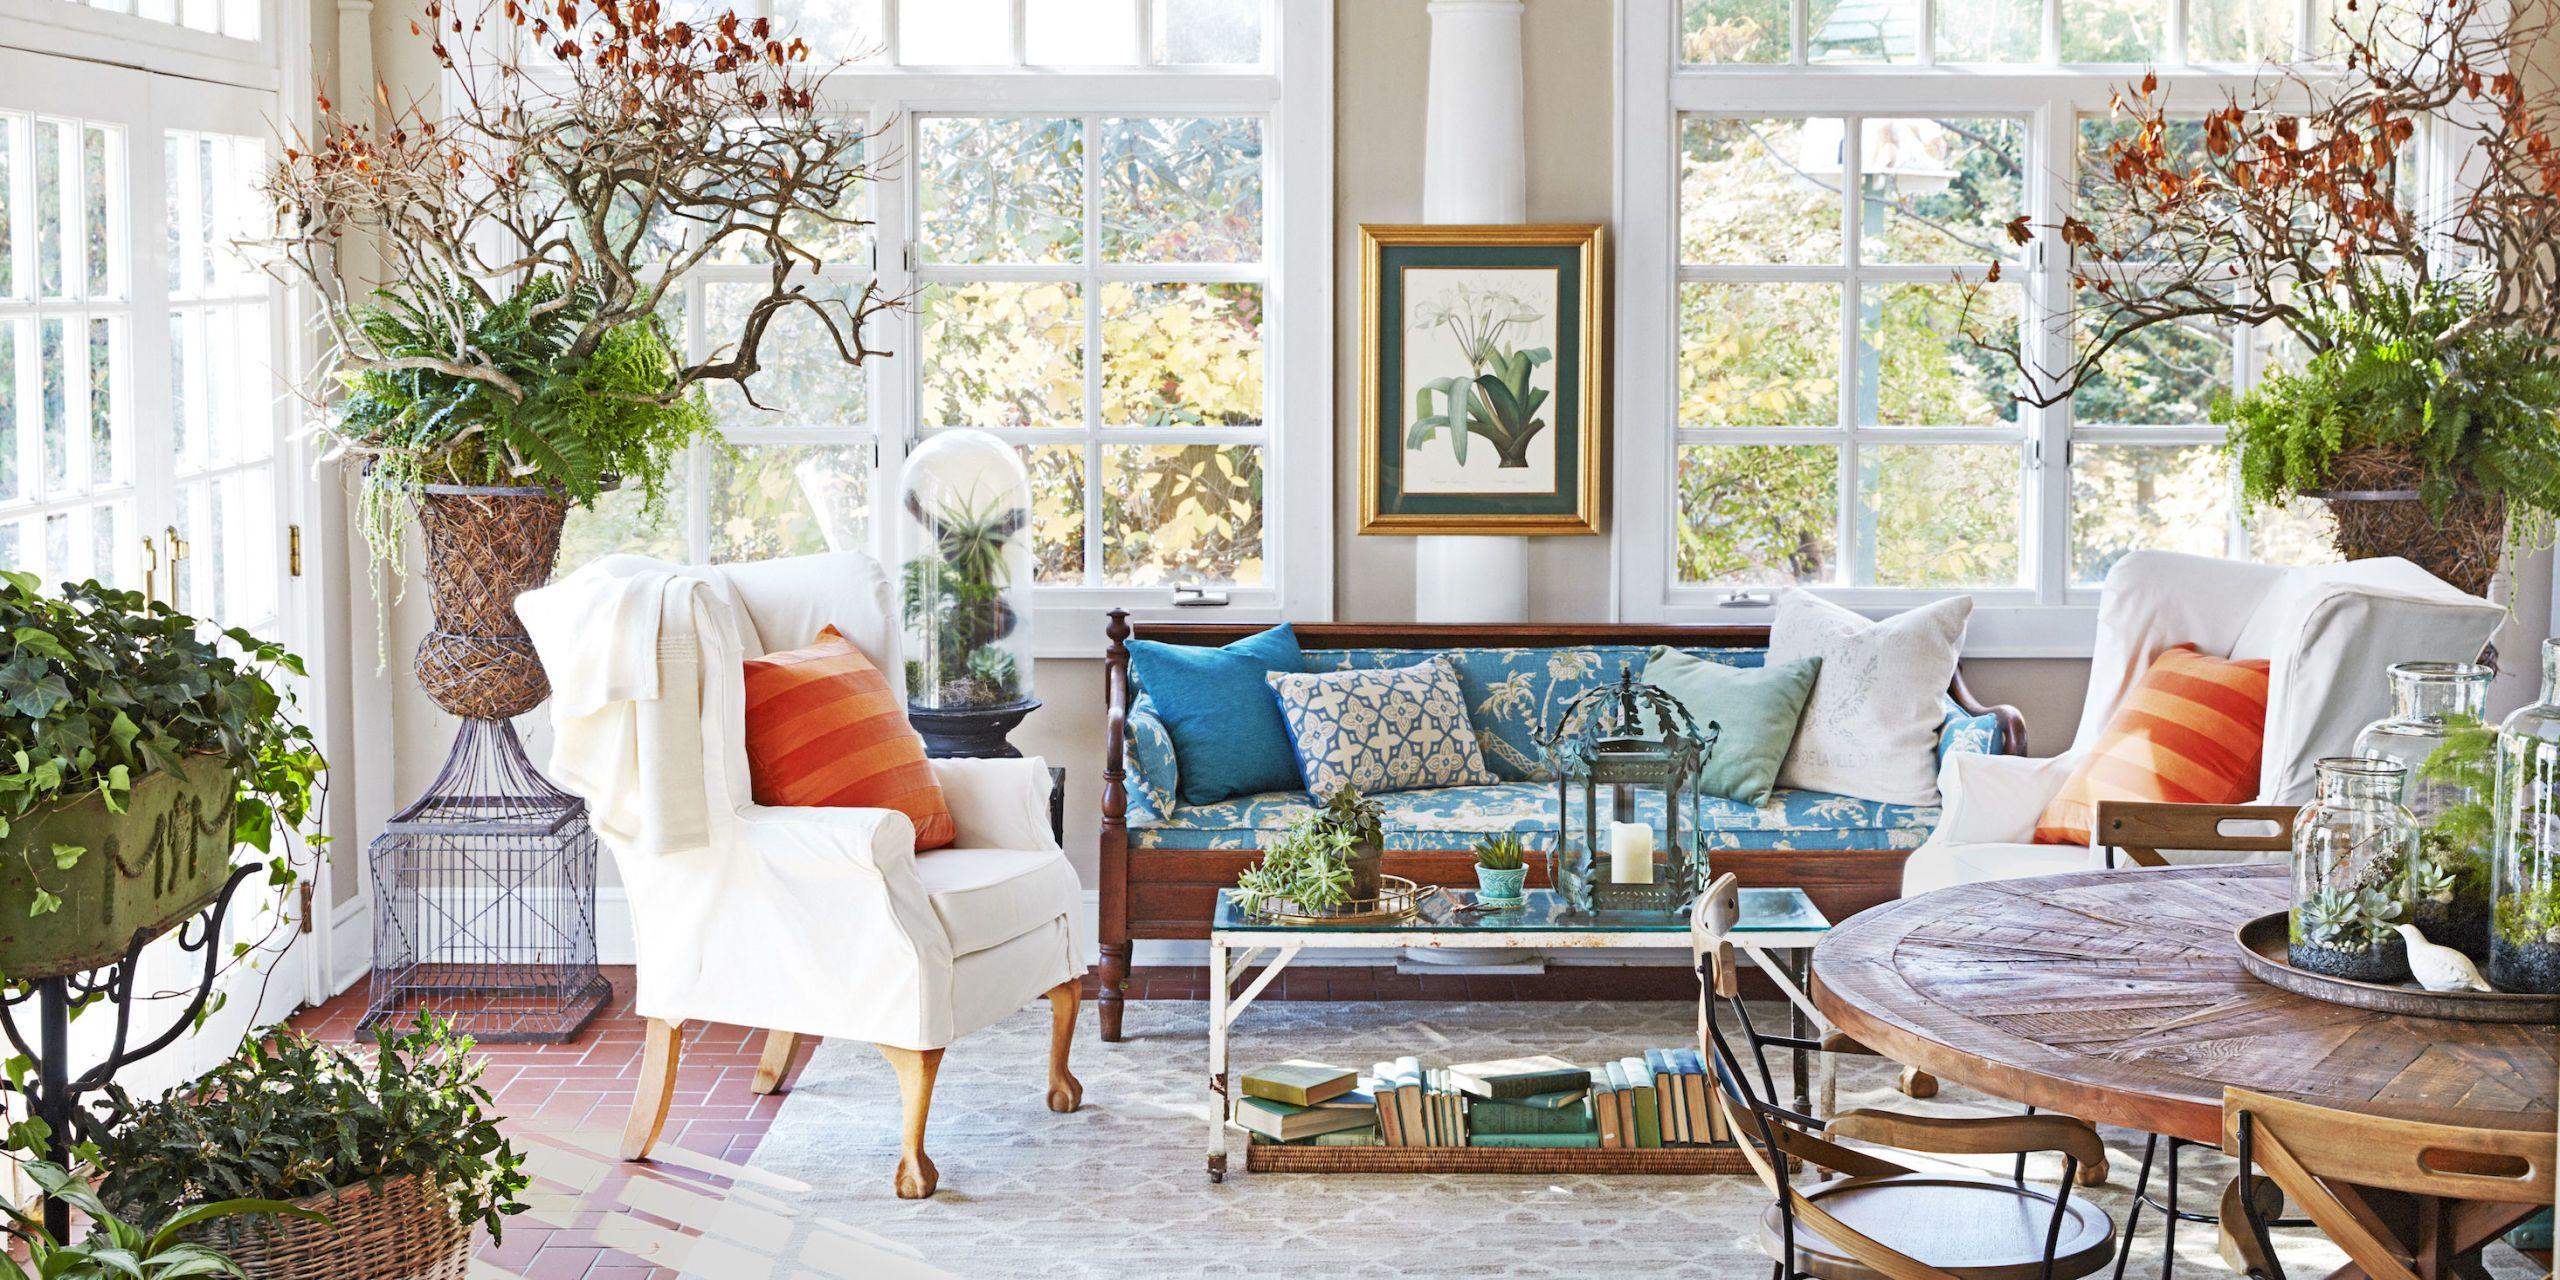 10 Sunroom Decorating Ideas That\u0027ll Brighten Your Space & 10 Sunroom Decorating Ideas - Best Designs for Sun Rooms